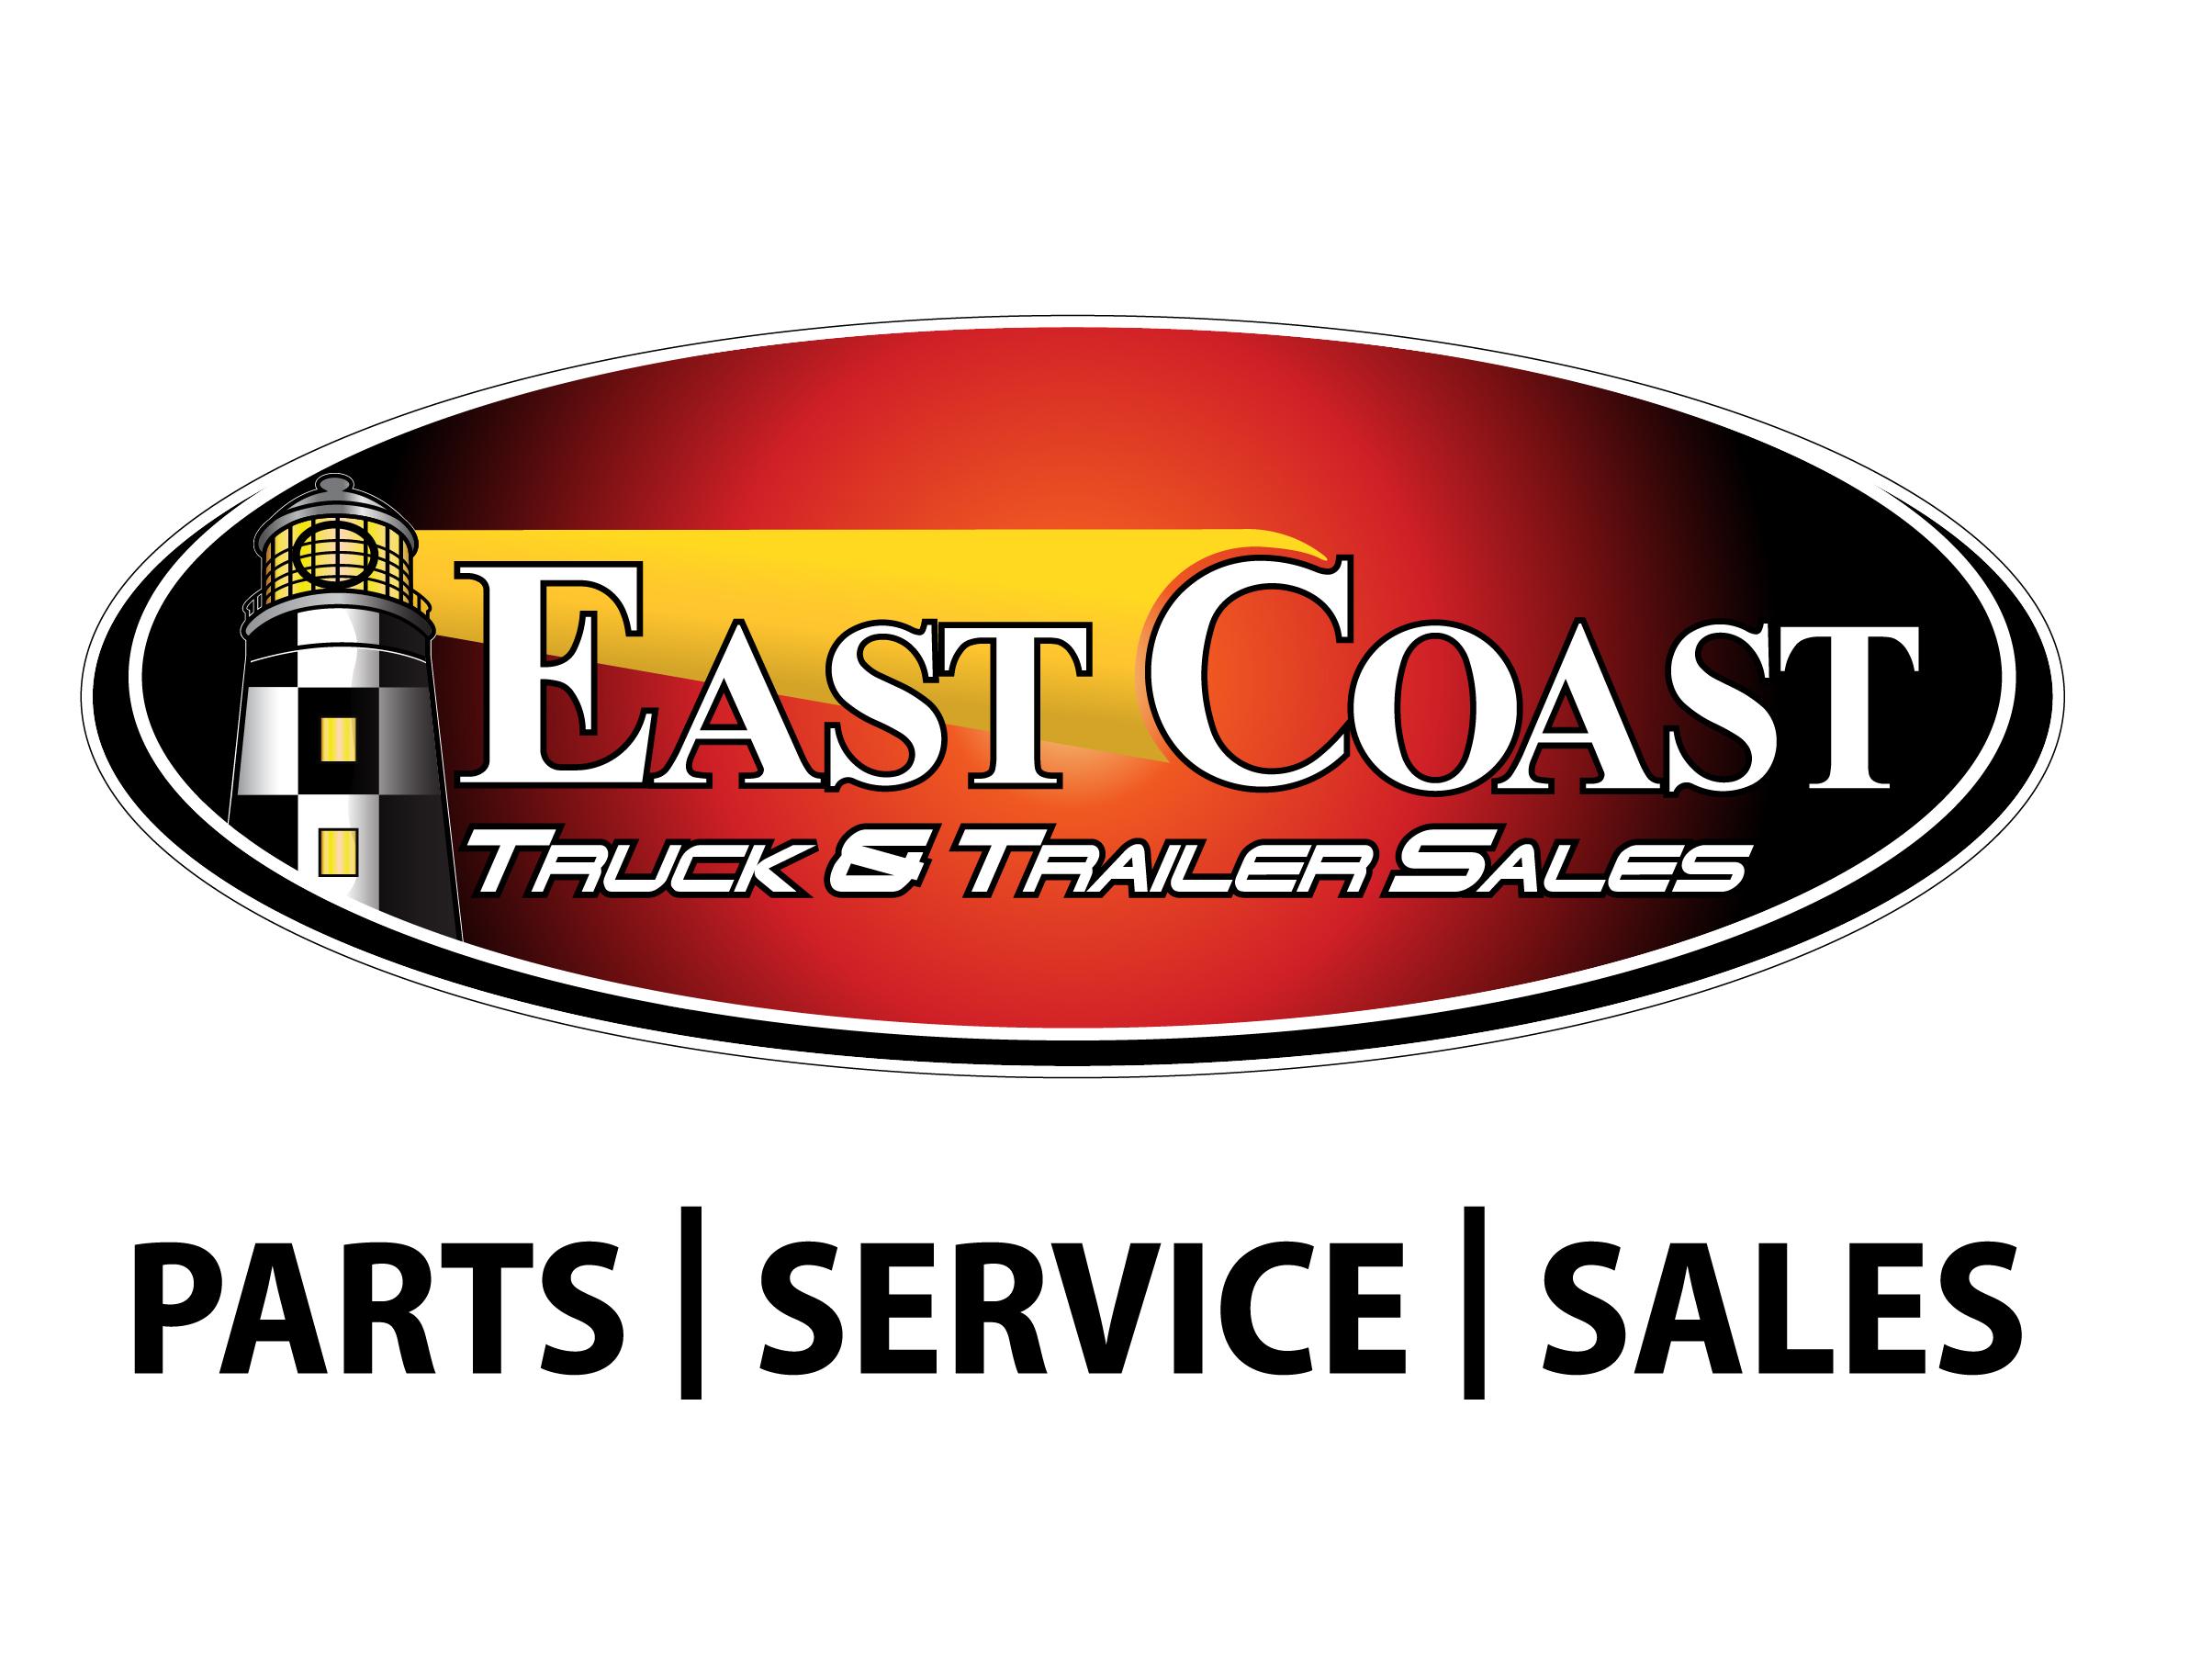 ectts-logo-tagline.jpg